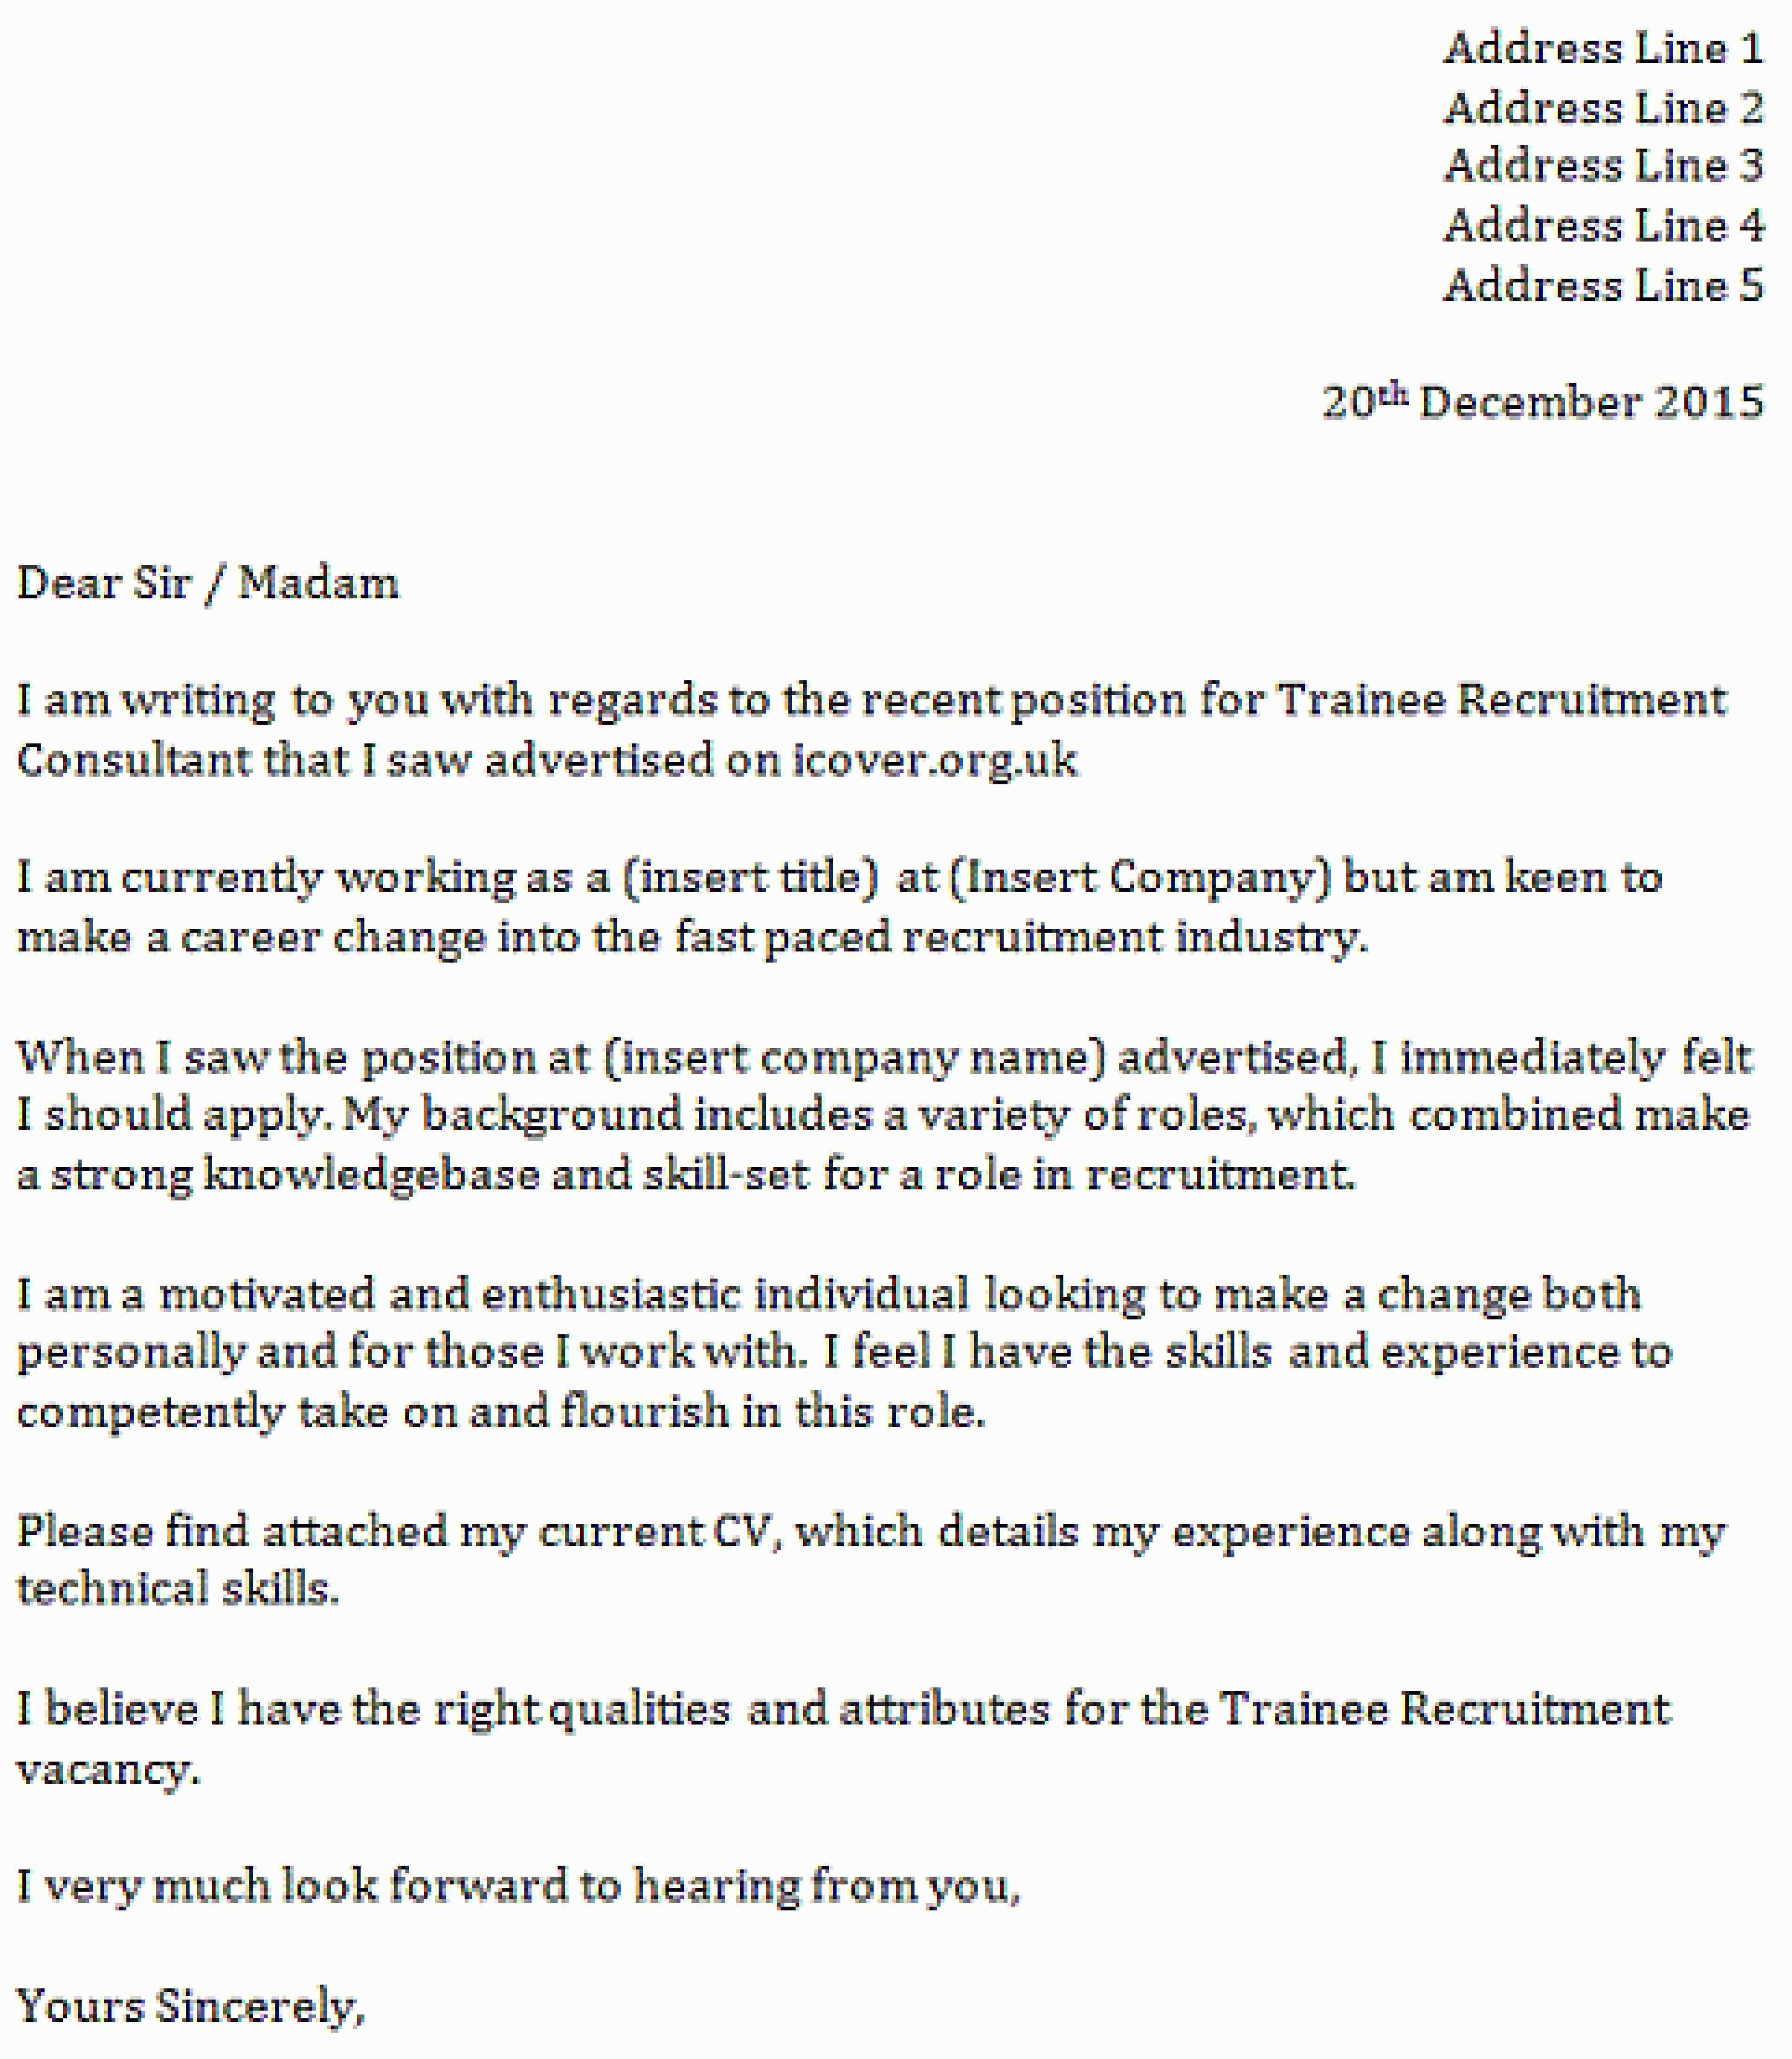 26 Recruiter Cover Letter Job Writing A Employment Statu Dissertation